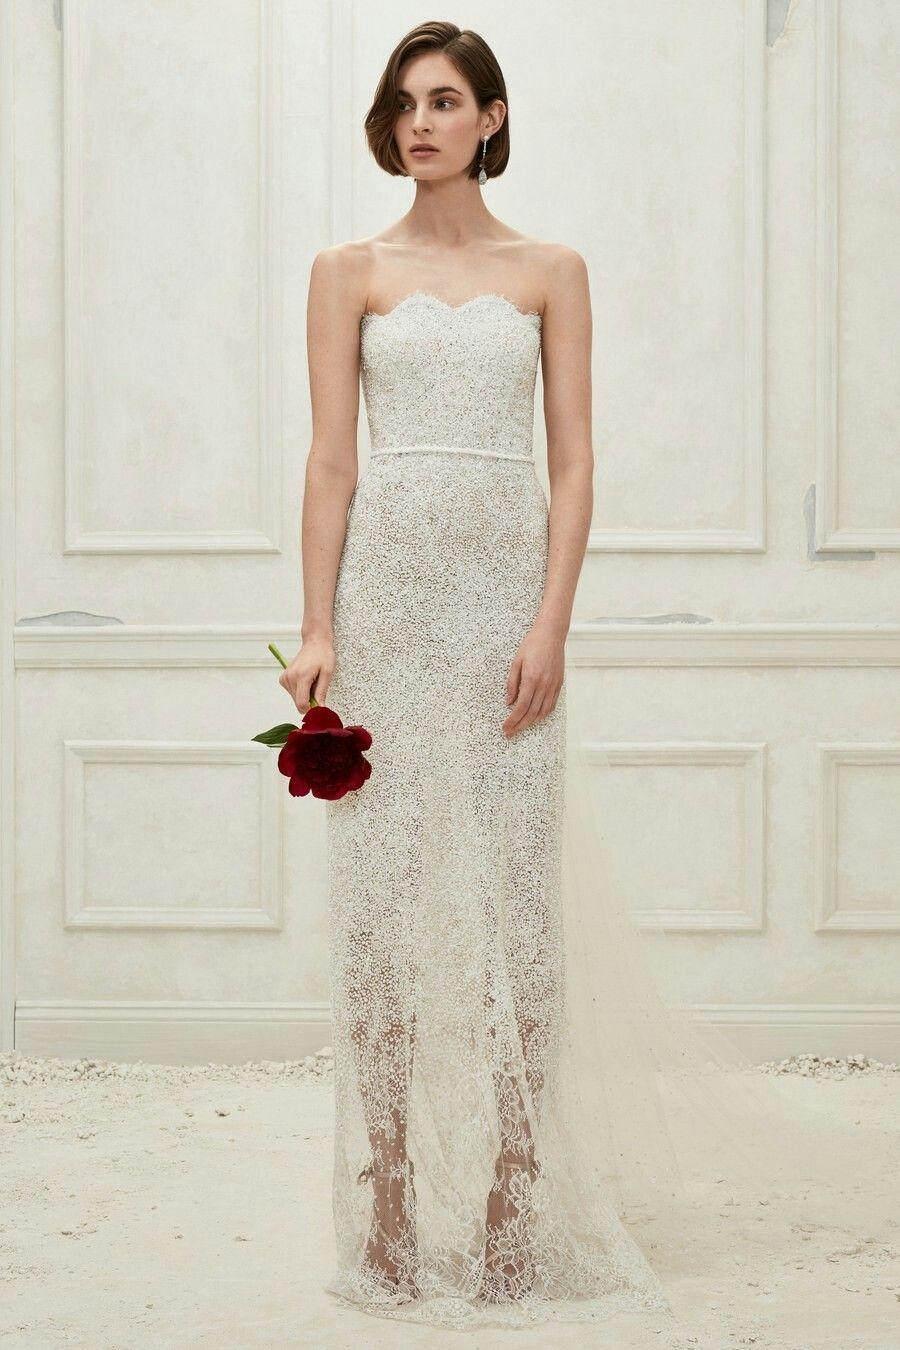 Oscar de la Renta Fall 20 Bridal   Wedding dresses, Wedding ...